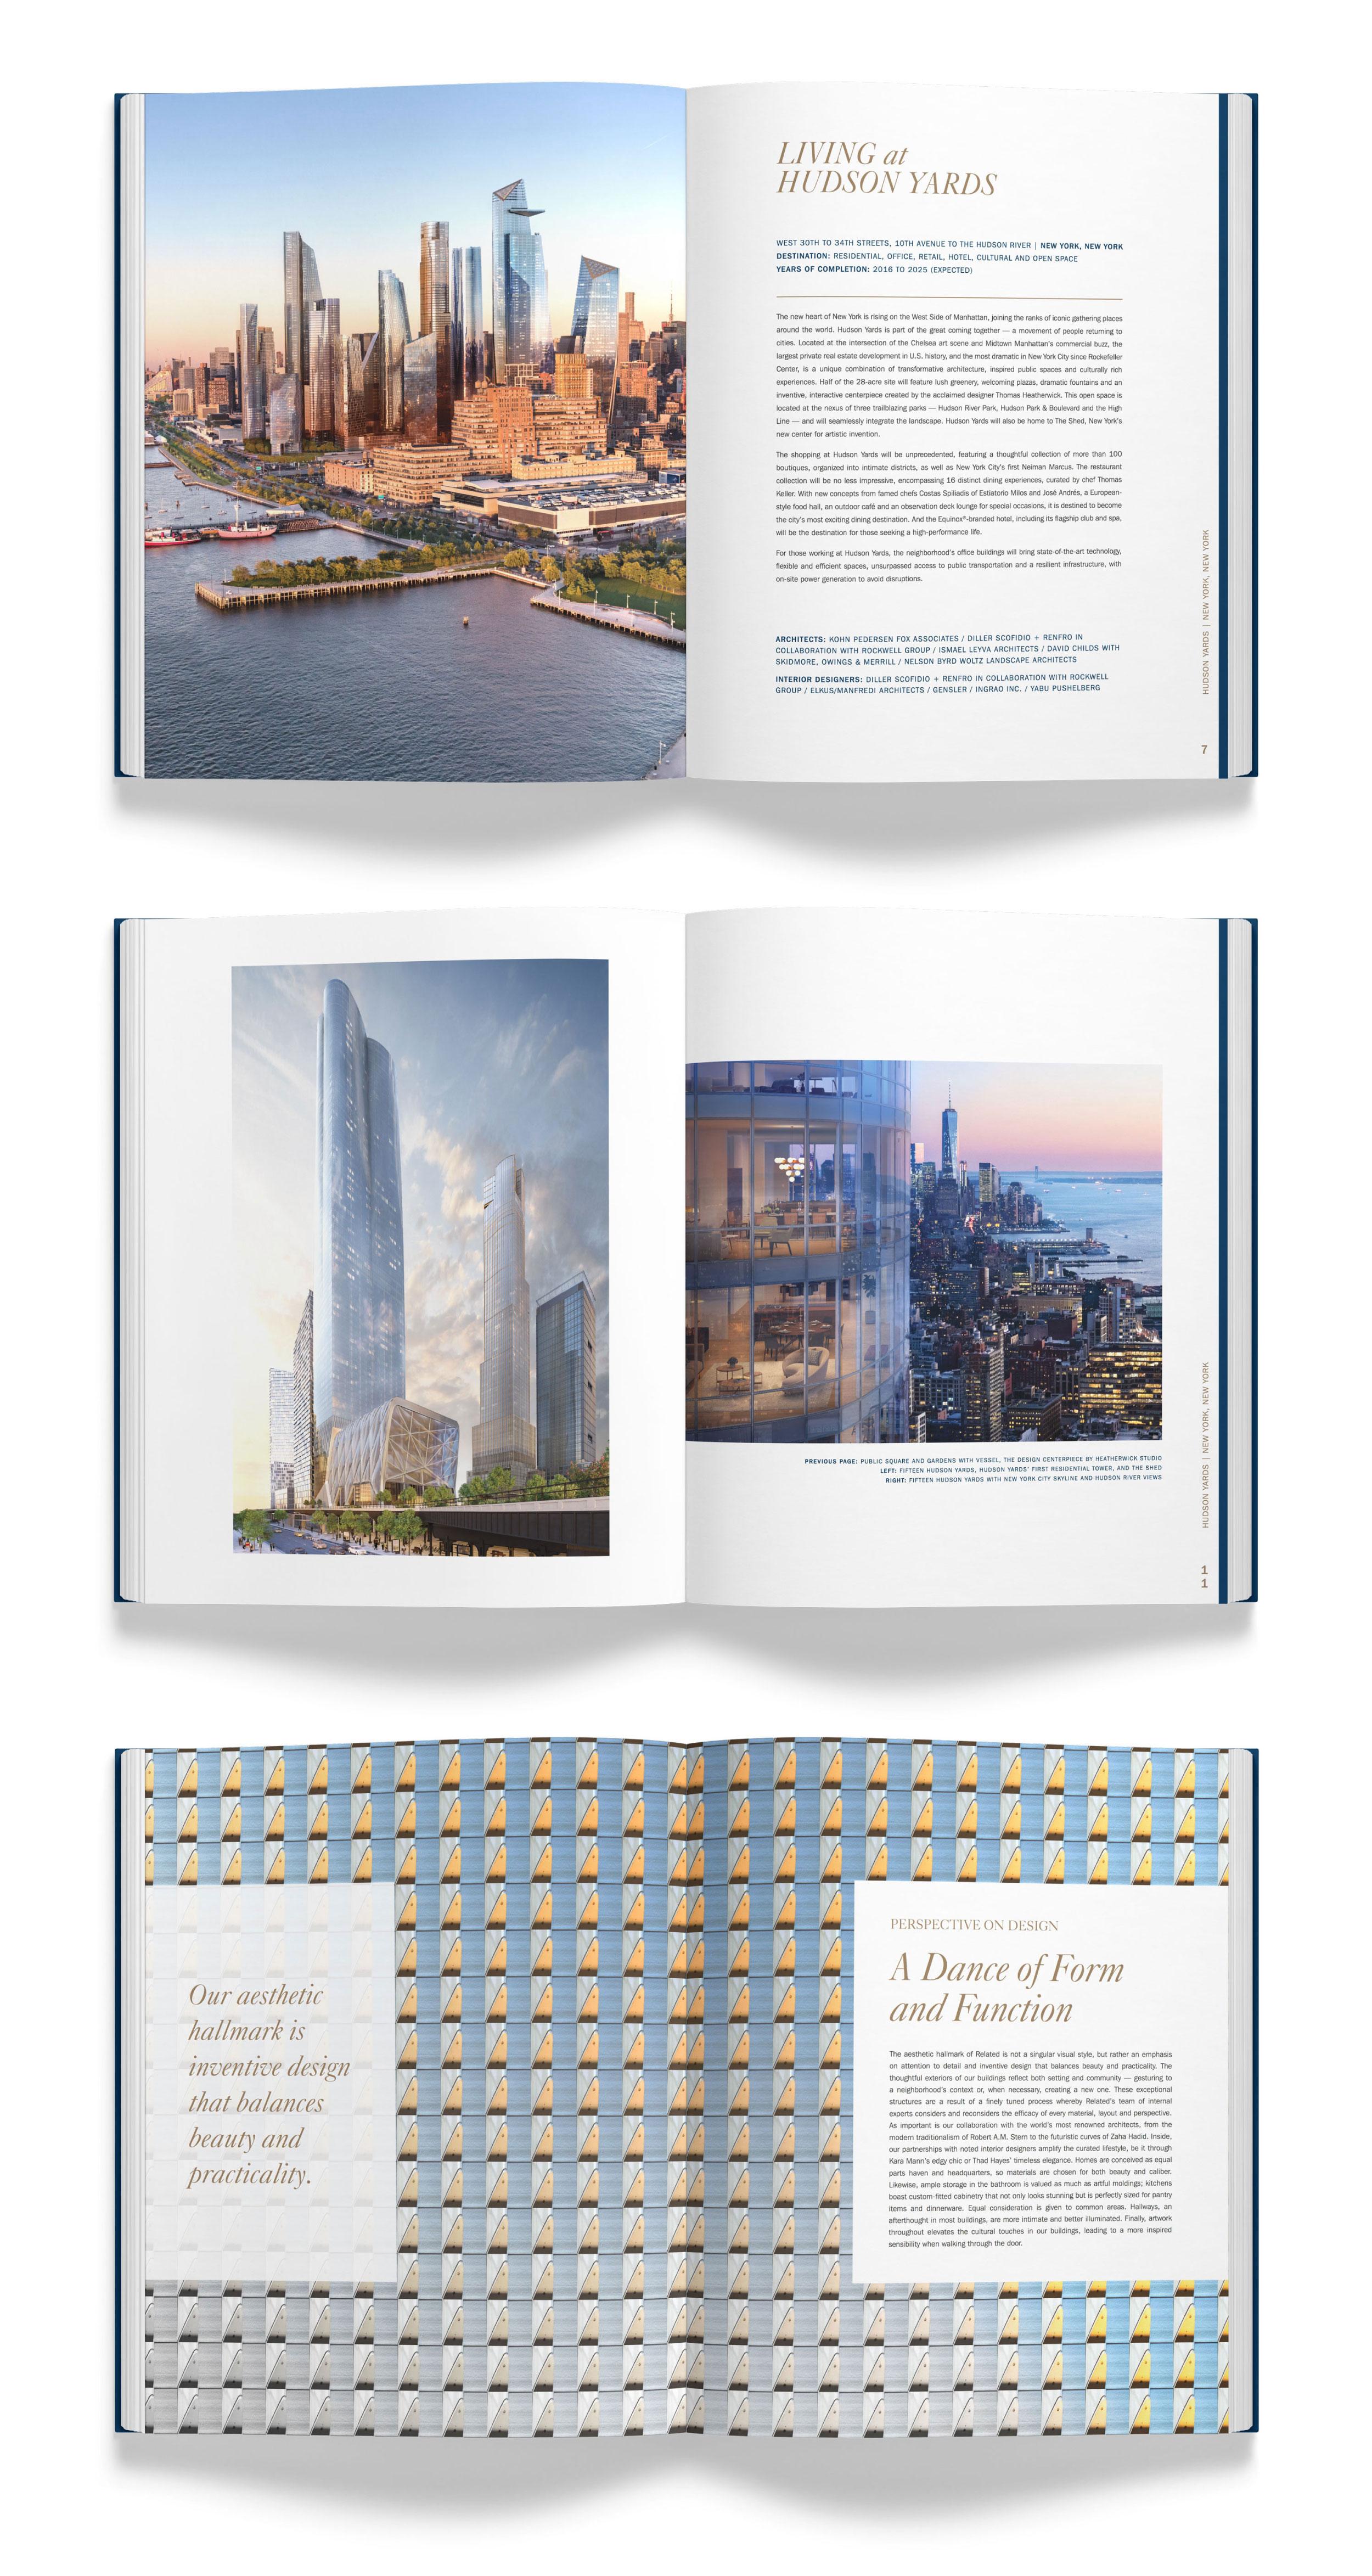 Perspectives-book-inside.jpg